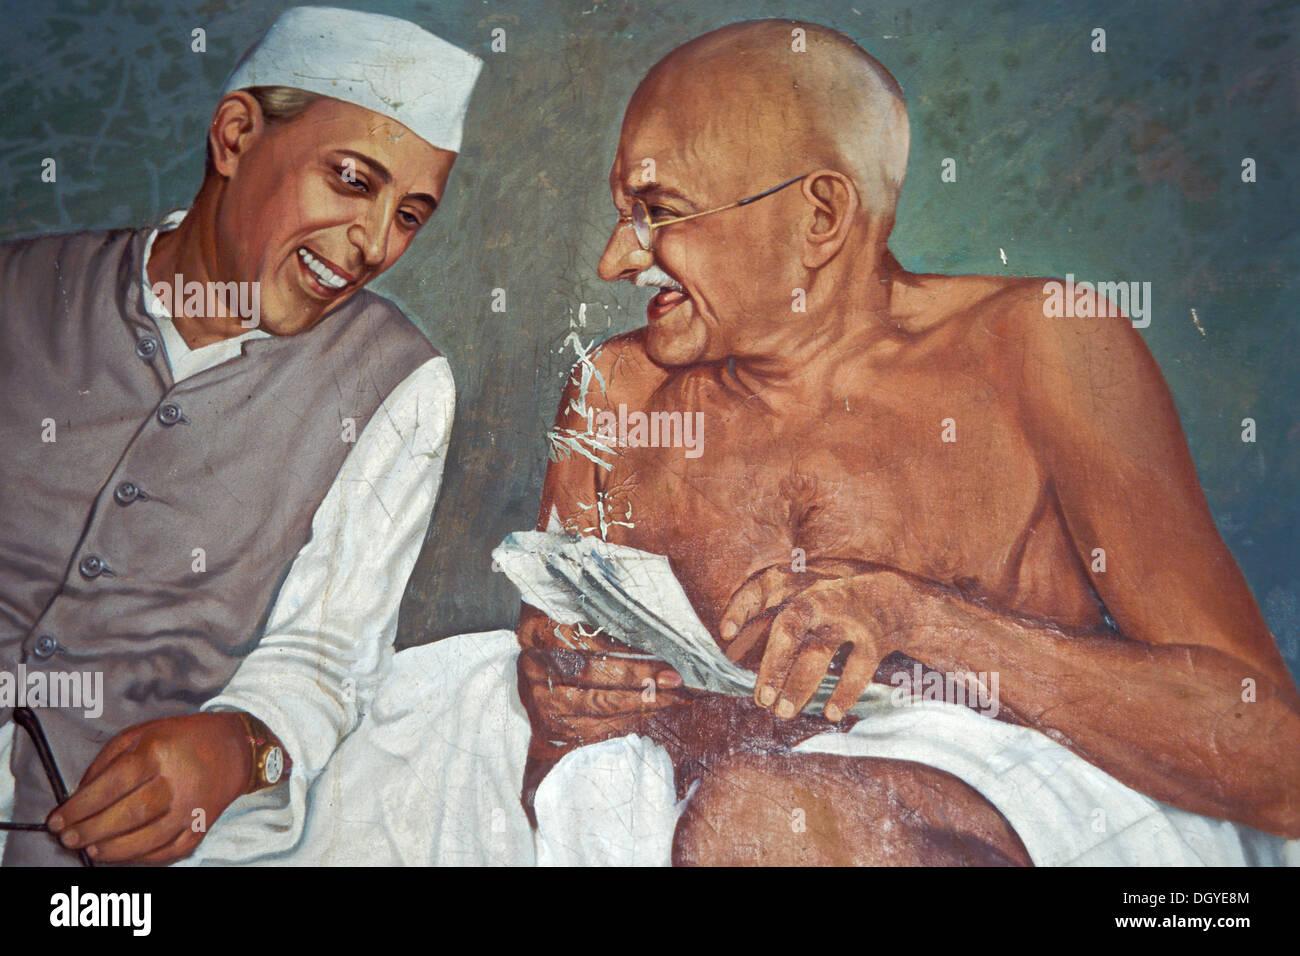 Painting, Pandit Jawaharlal Nehru, India's first prime minister with Gandhi, Aga Khan Palace, Pune or Poona, - Stock Image